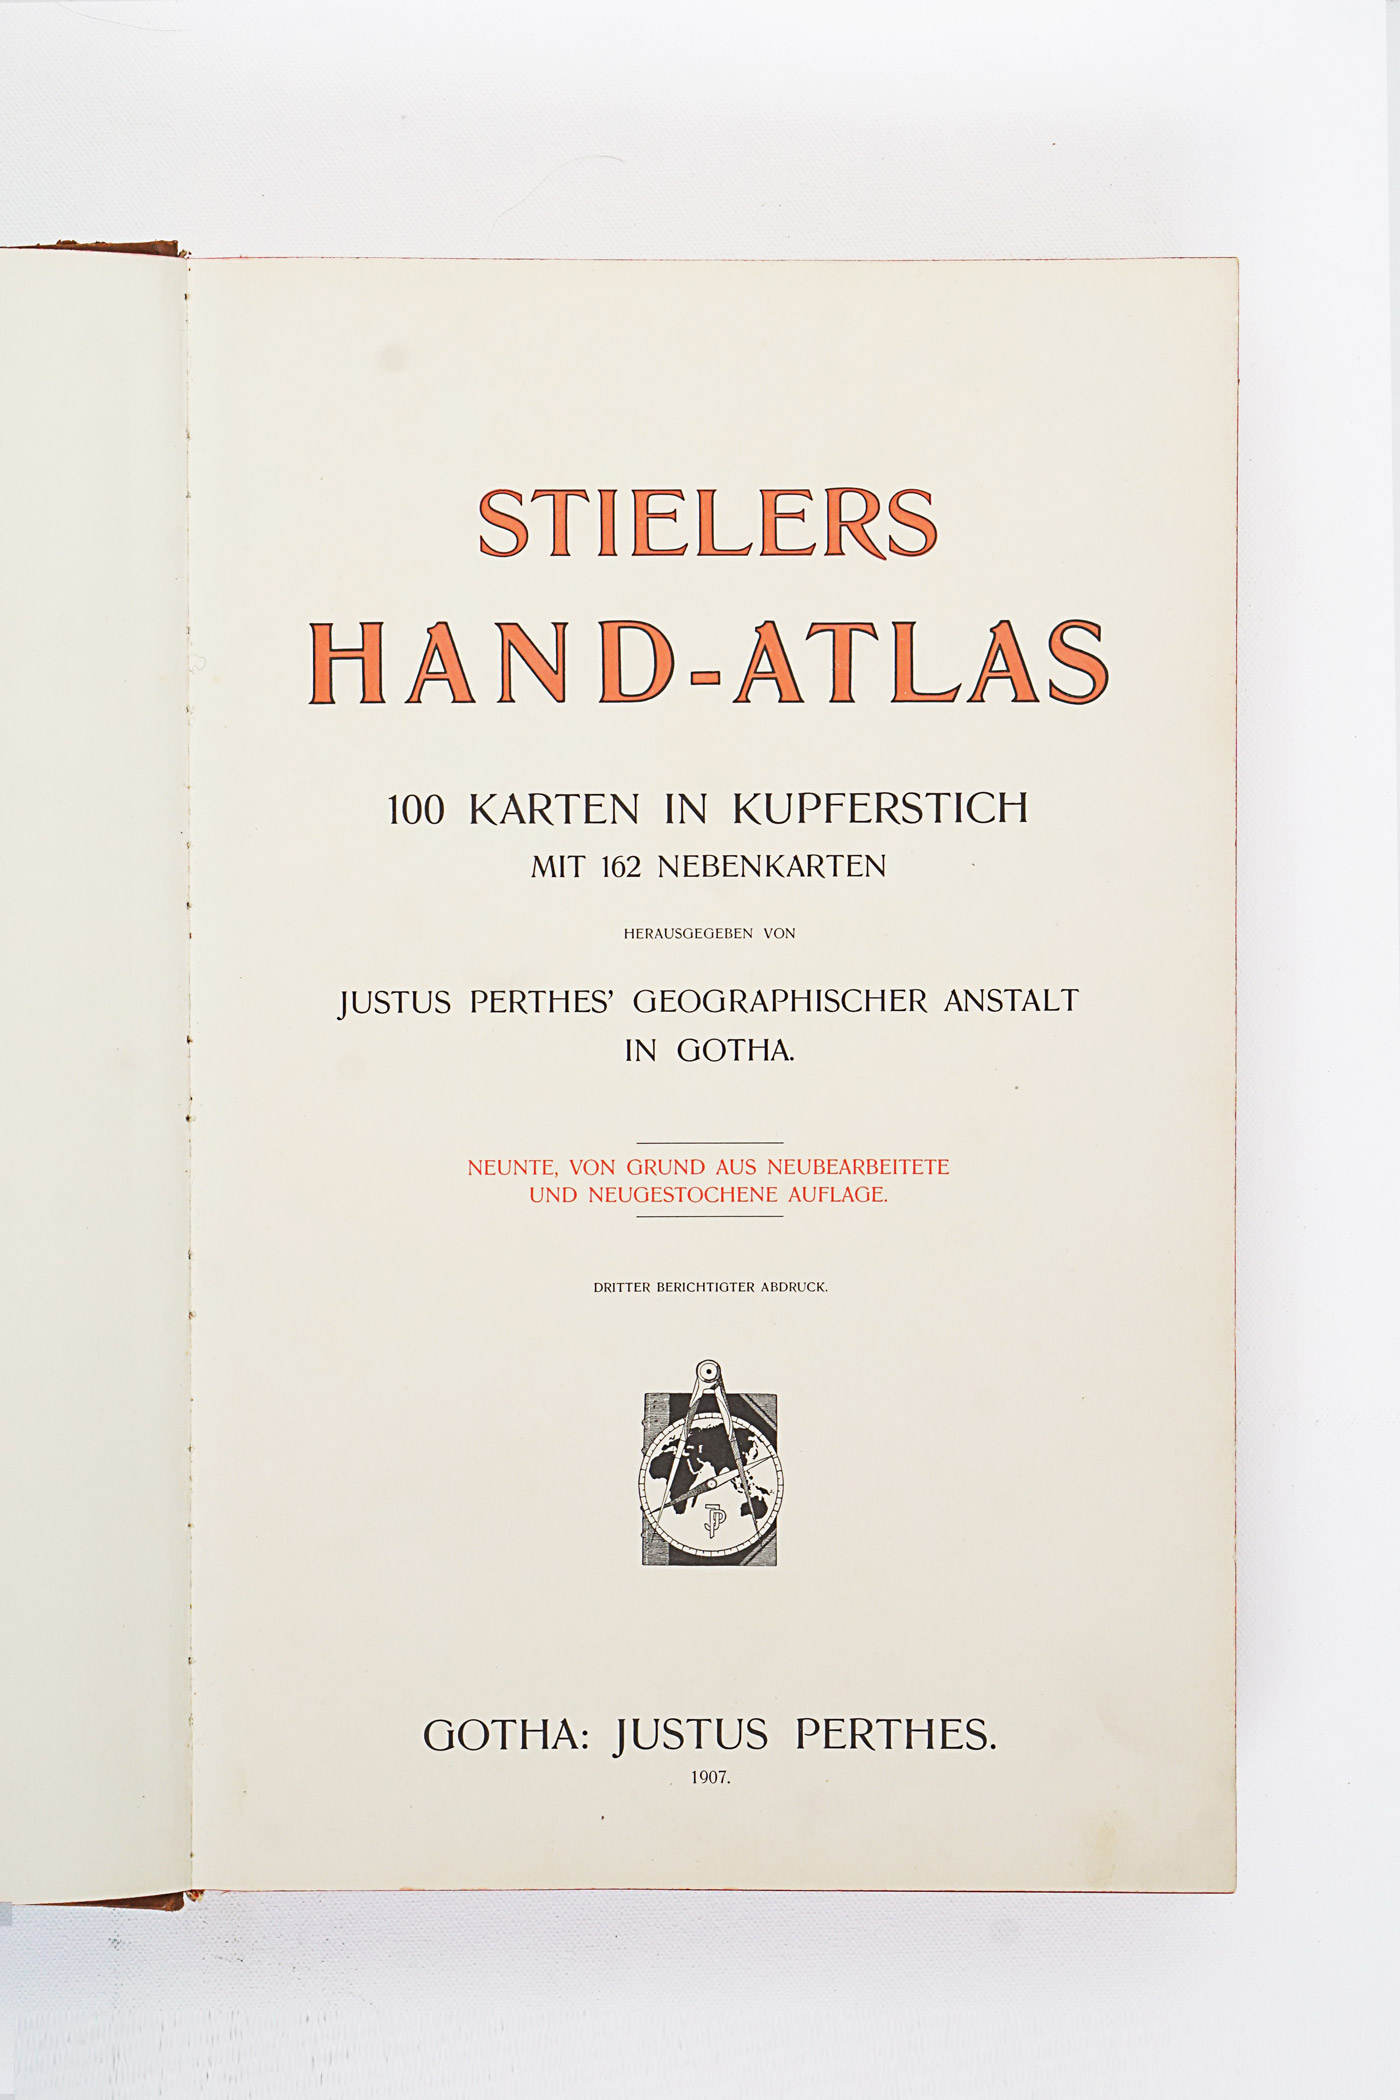 Stielers Handatlas, 9th edition